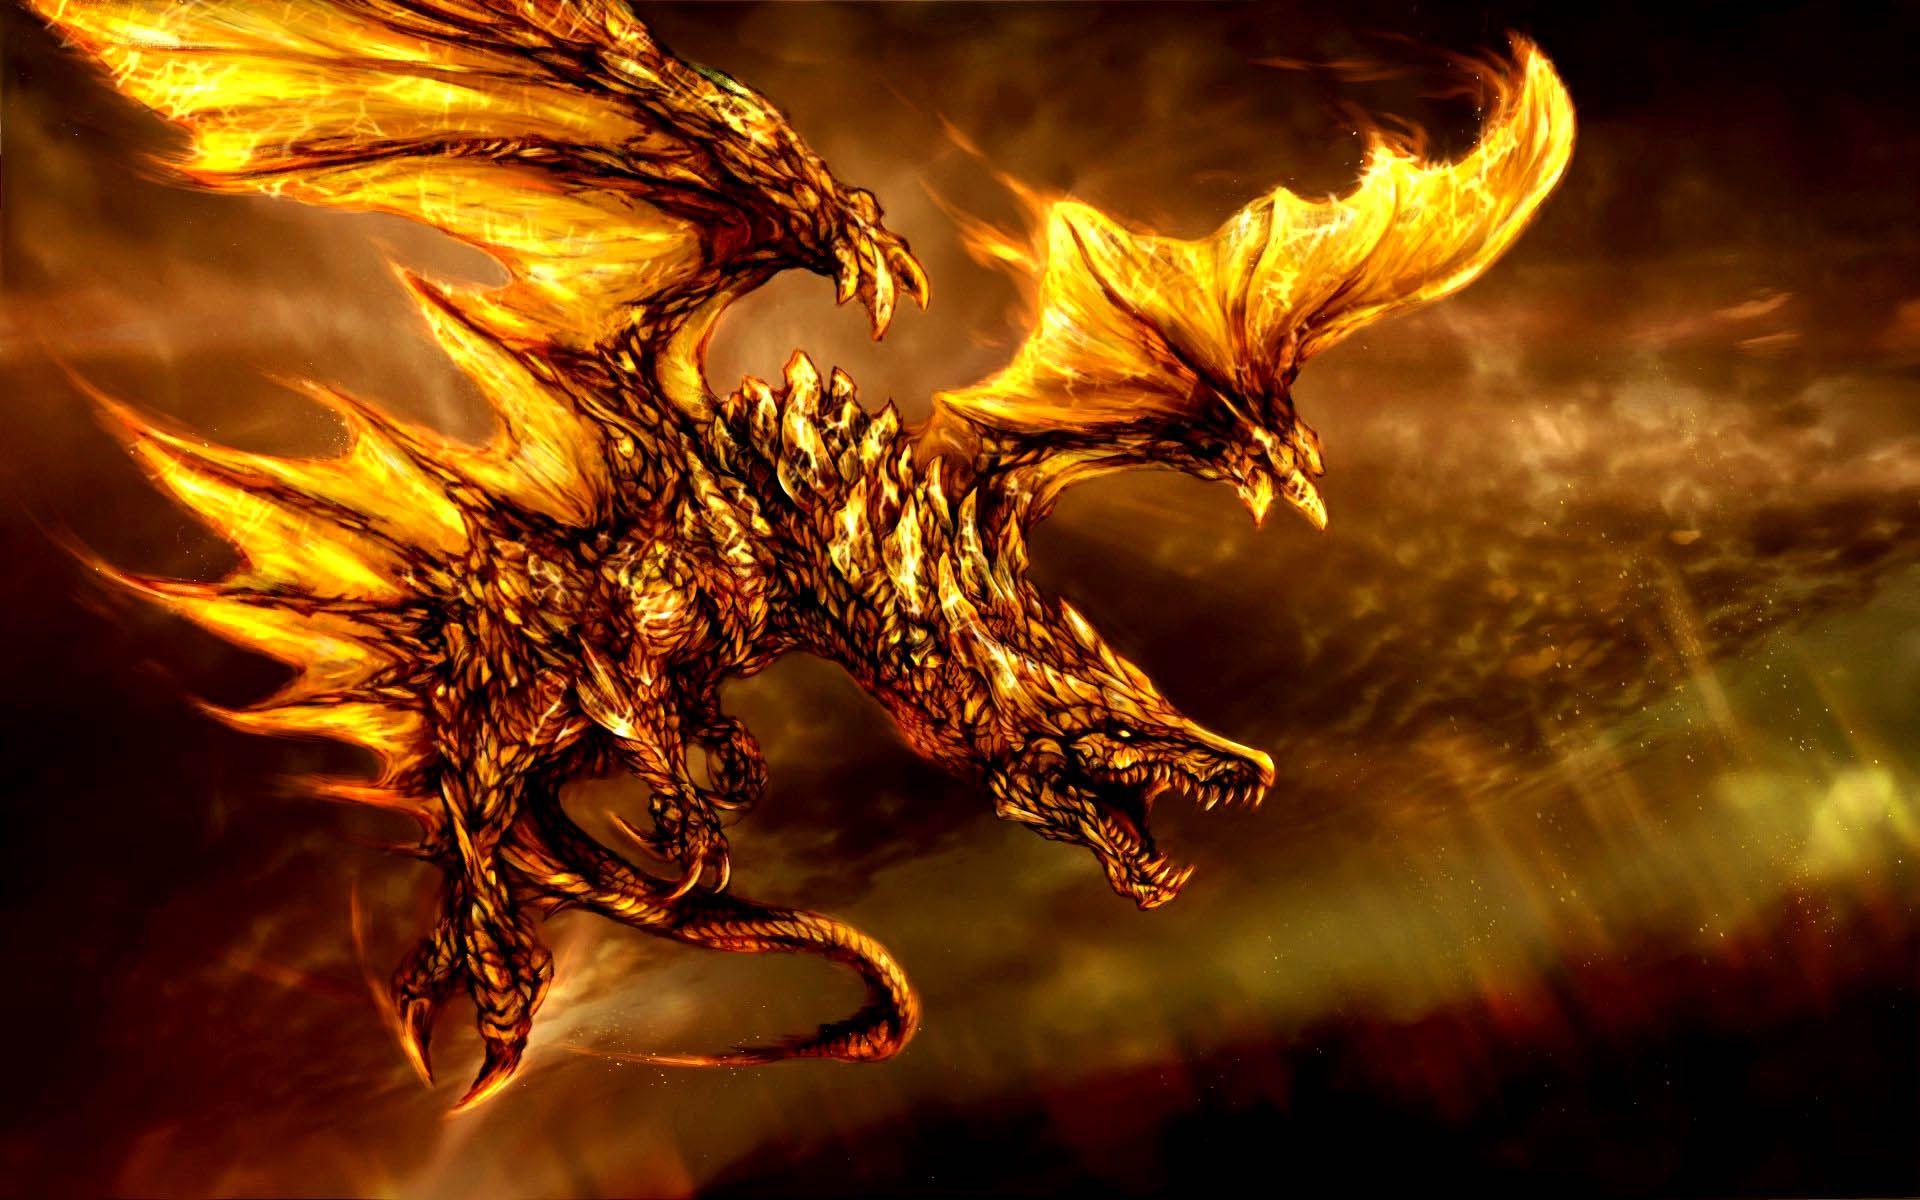 Hd wallpaper dragon - 3d Fire Dragon Wallpaper